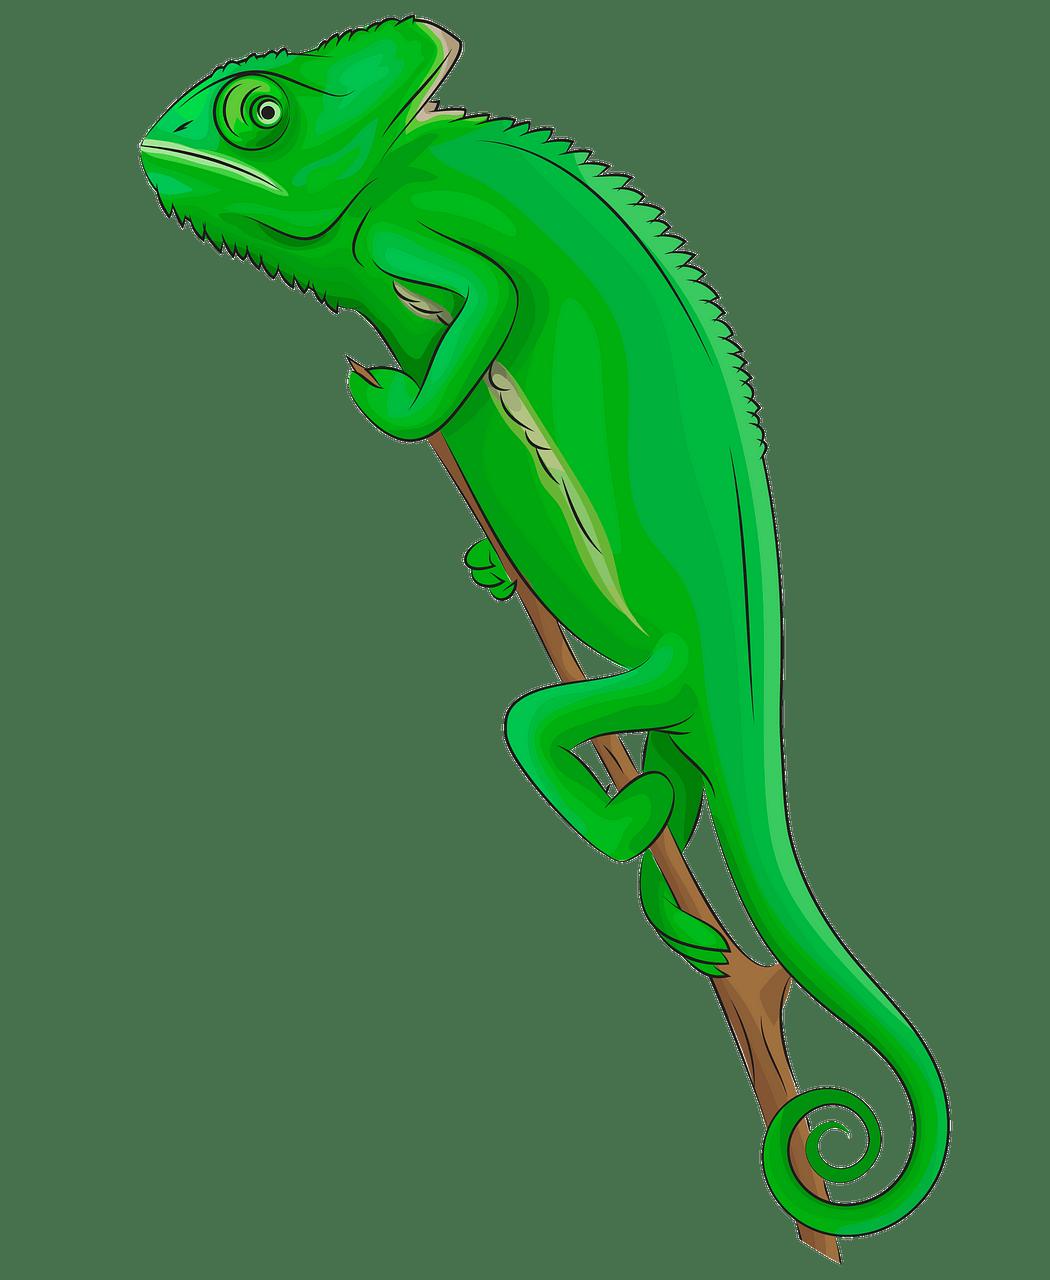 Veiled chameleon clipart. Free download..